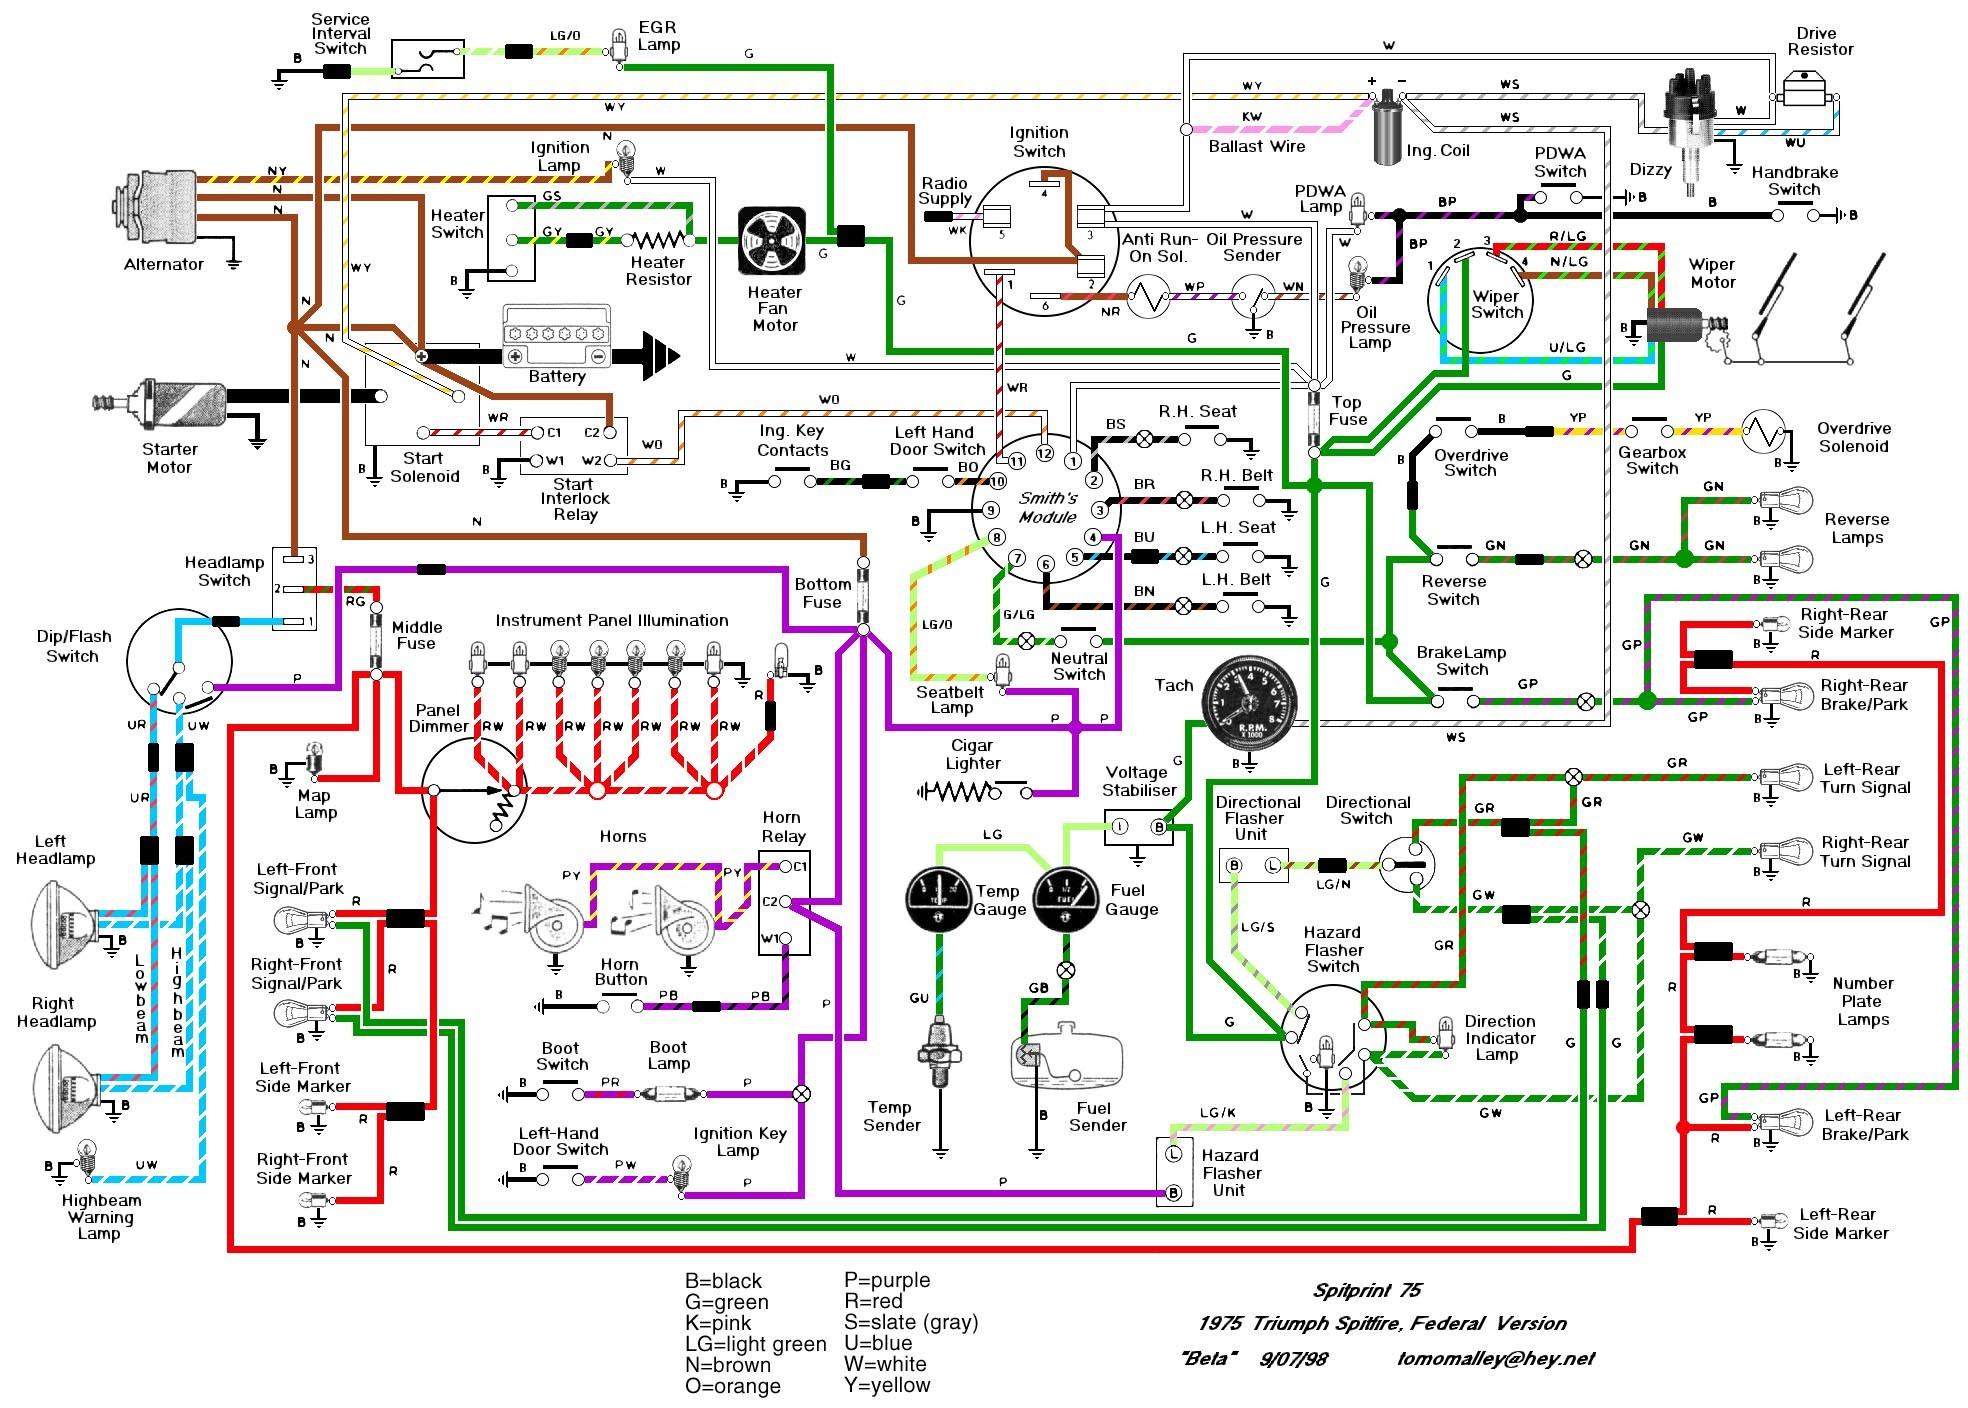 1955 mg wiring diagram volvo 940 engine car electrical system my